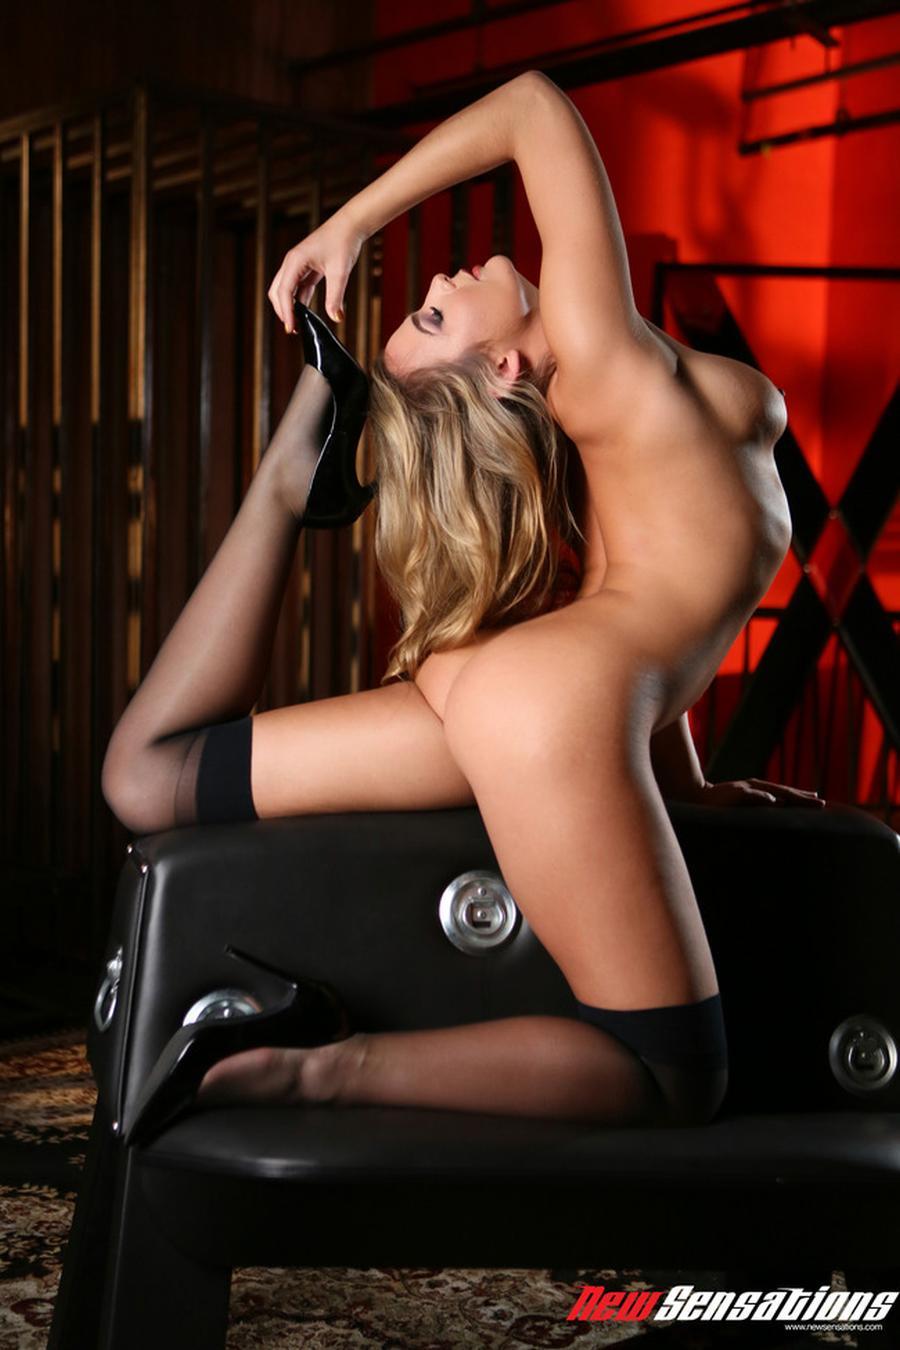 blair-williams-sexy-rode-lingerie-en-naakt-12